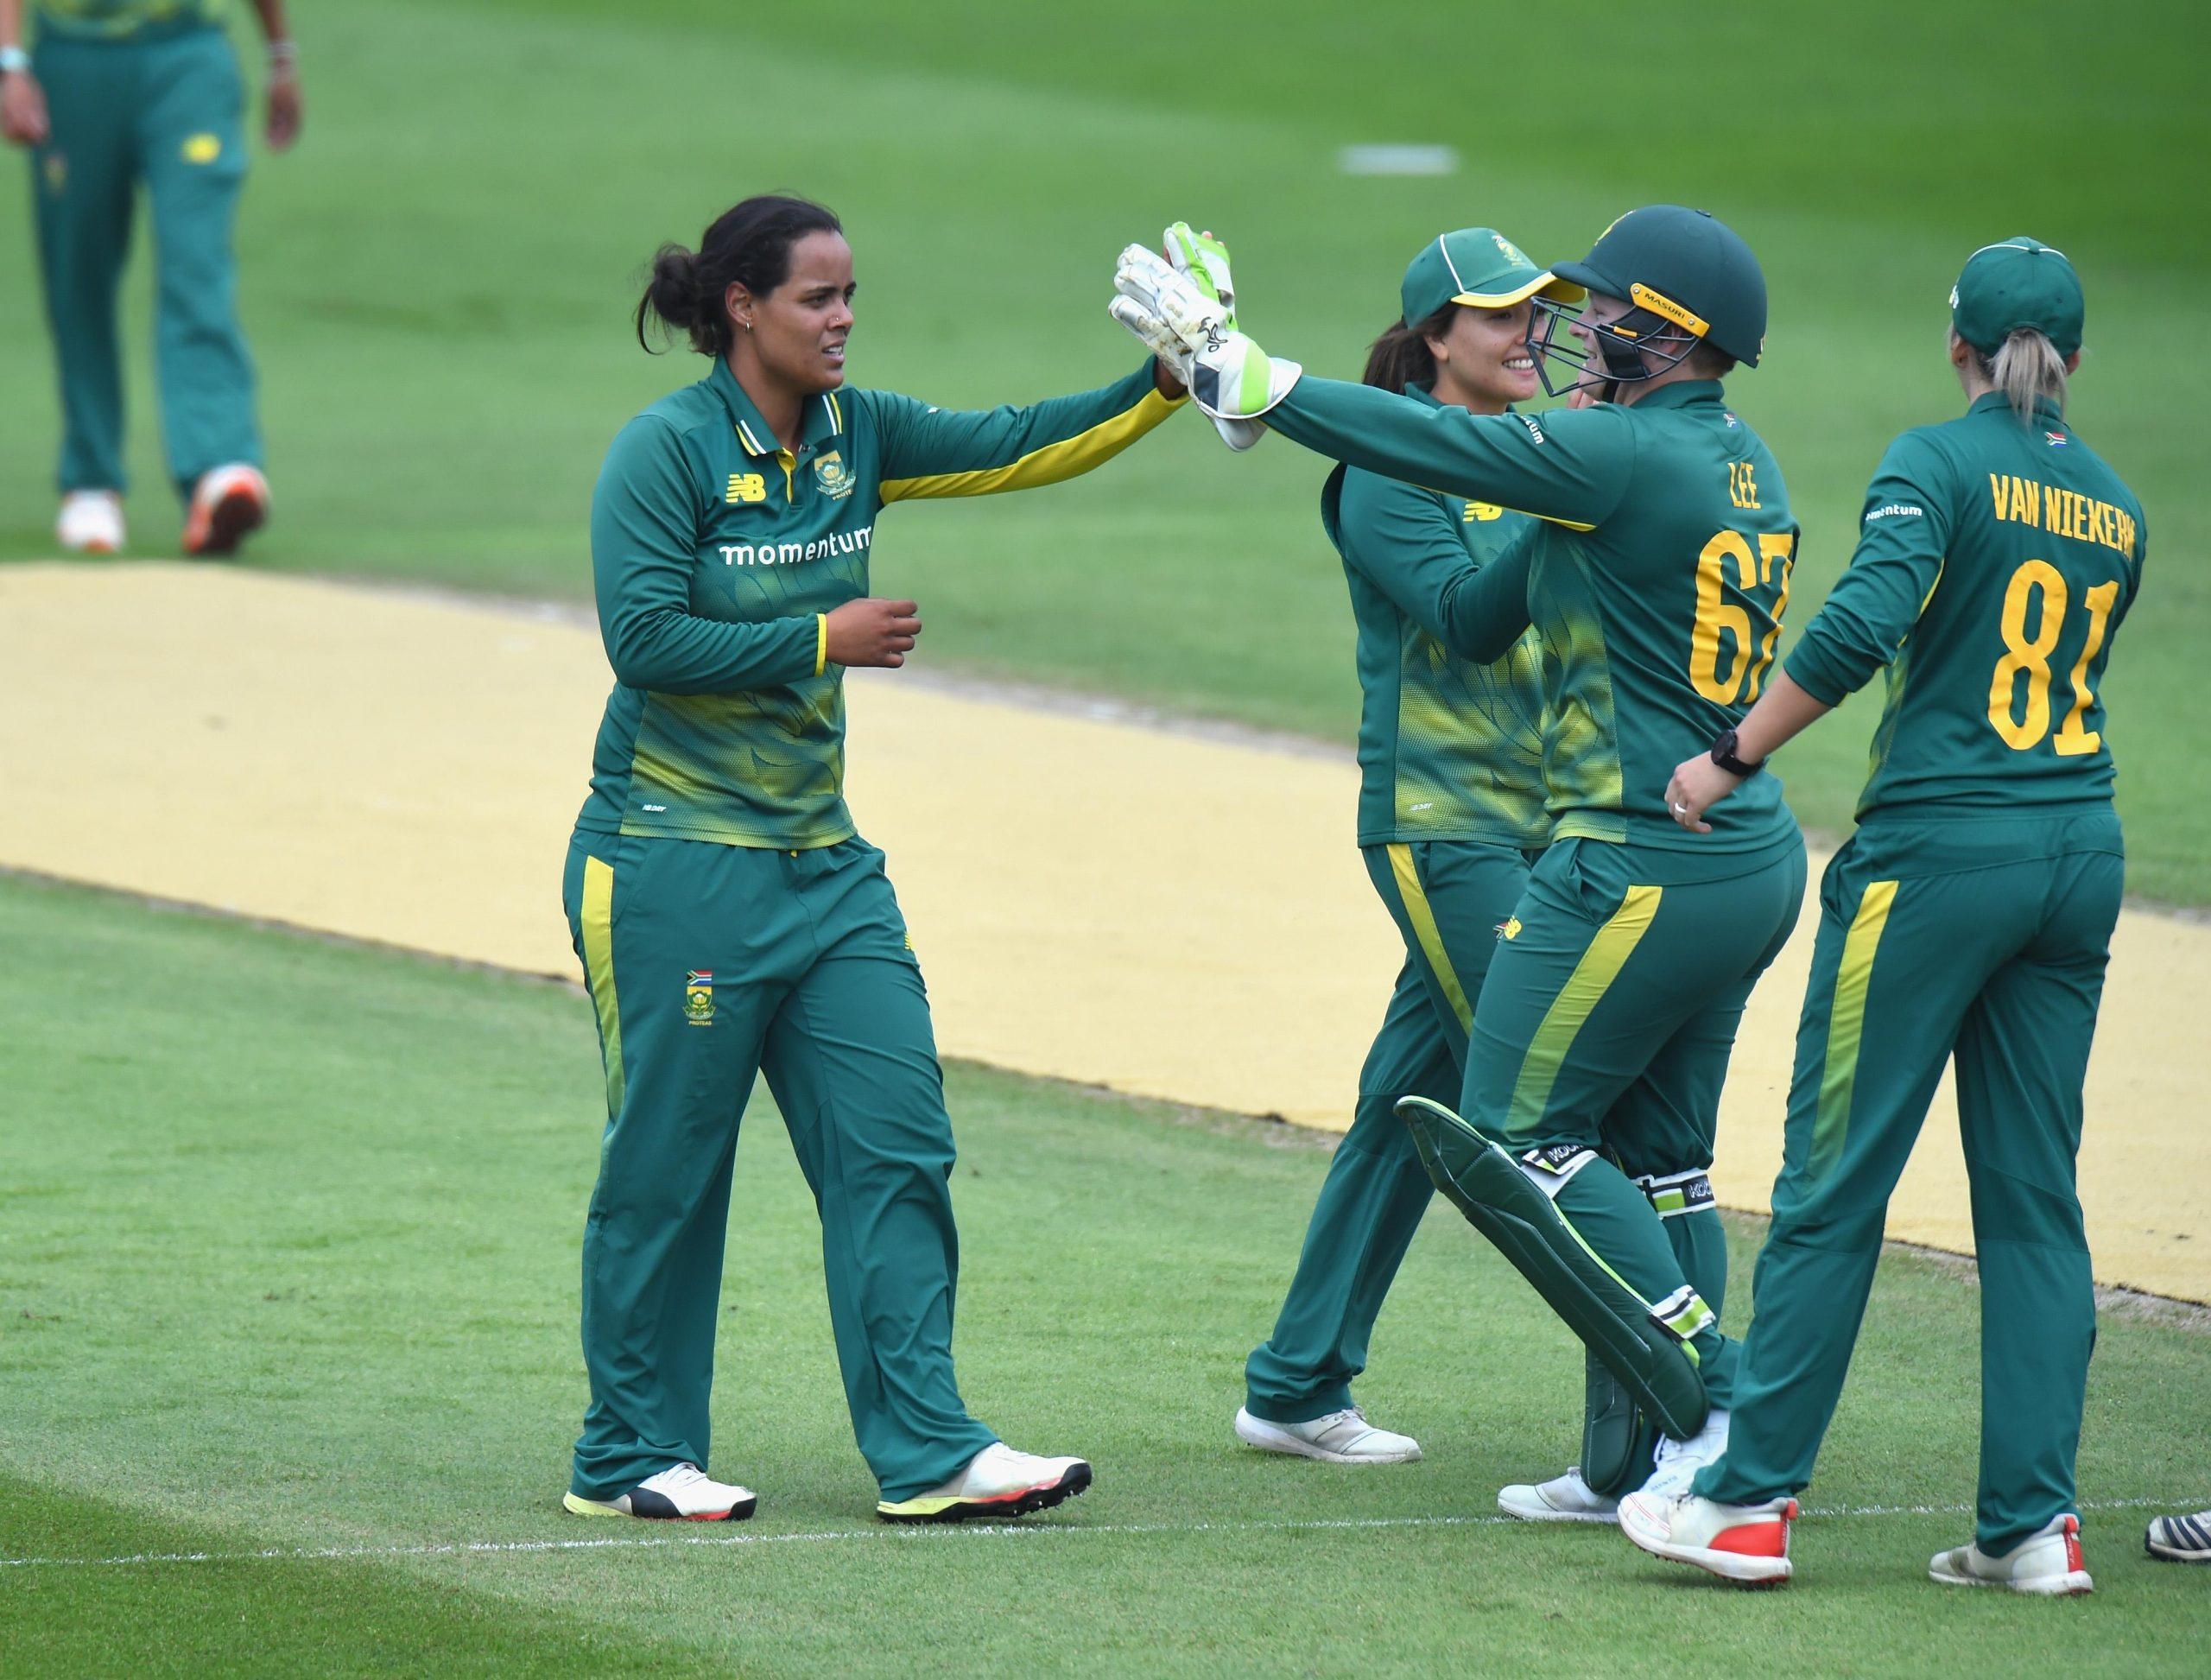 SA women's cricket team tour to UK scrapped - Sports Leo